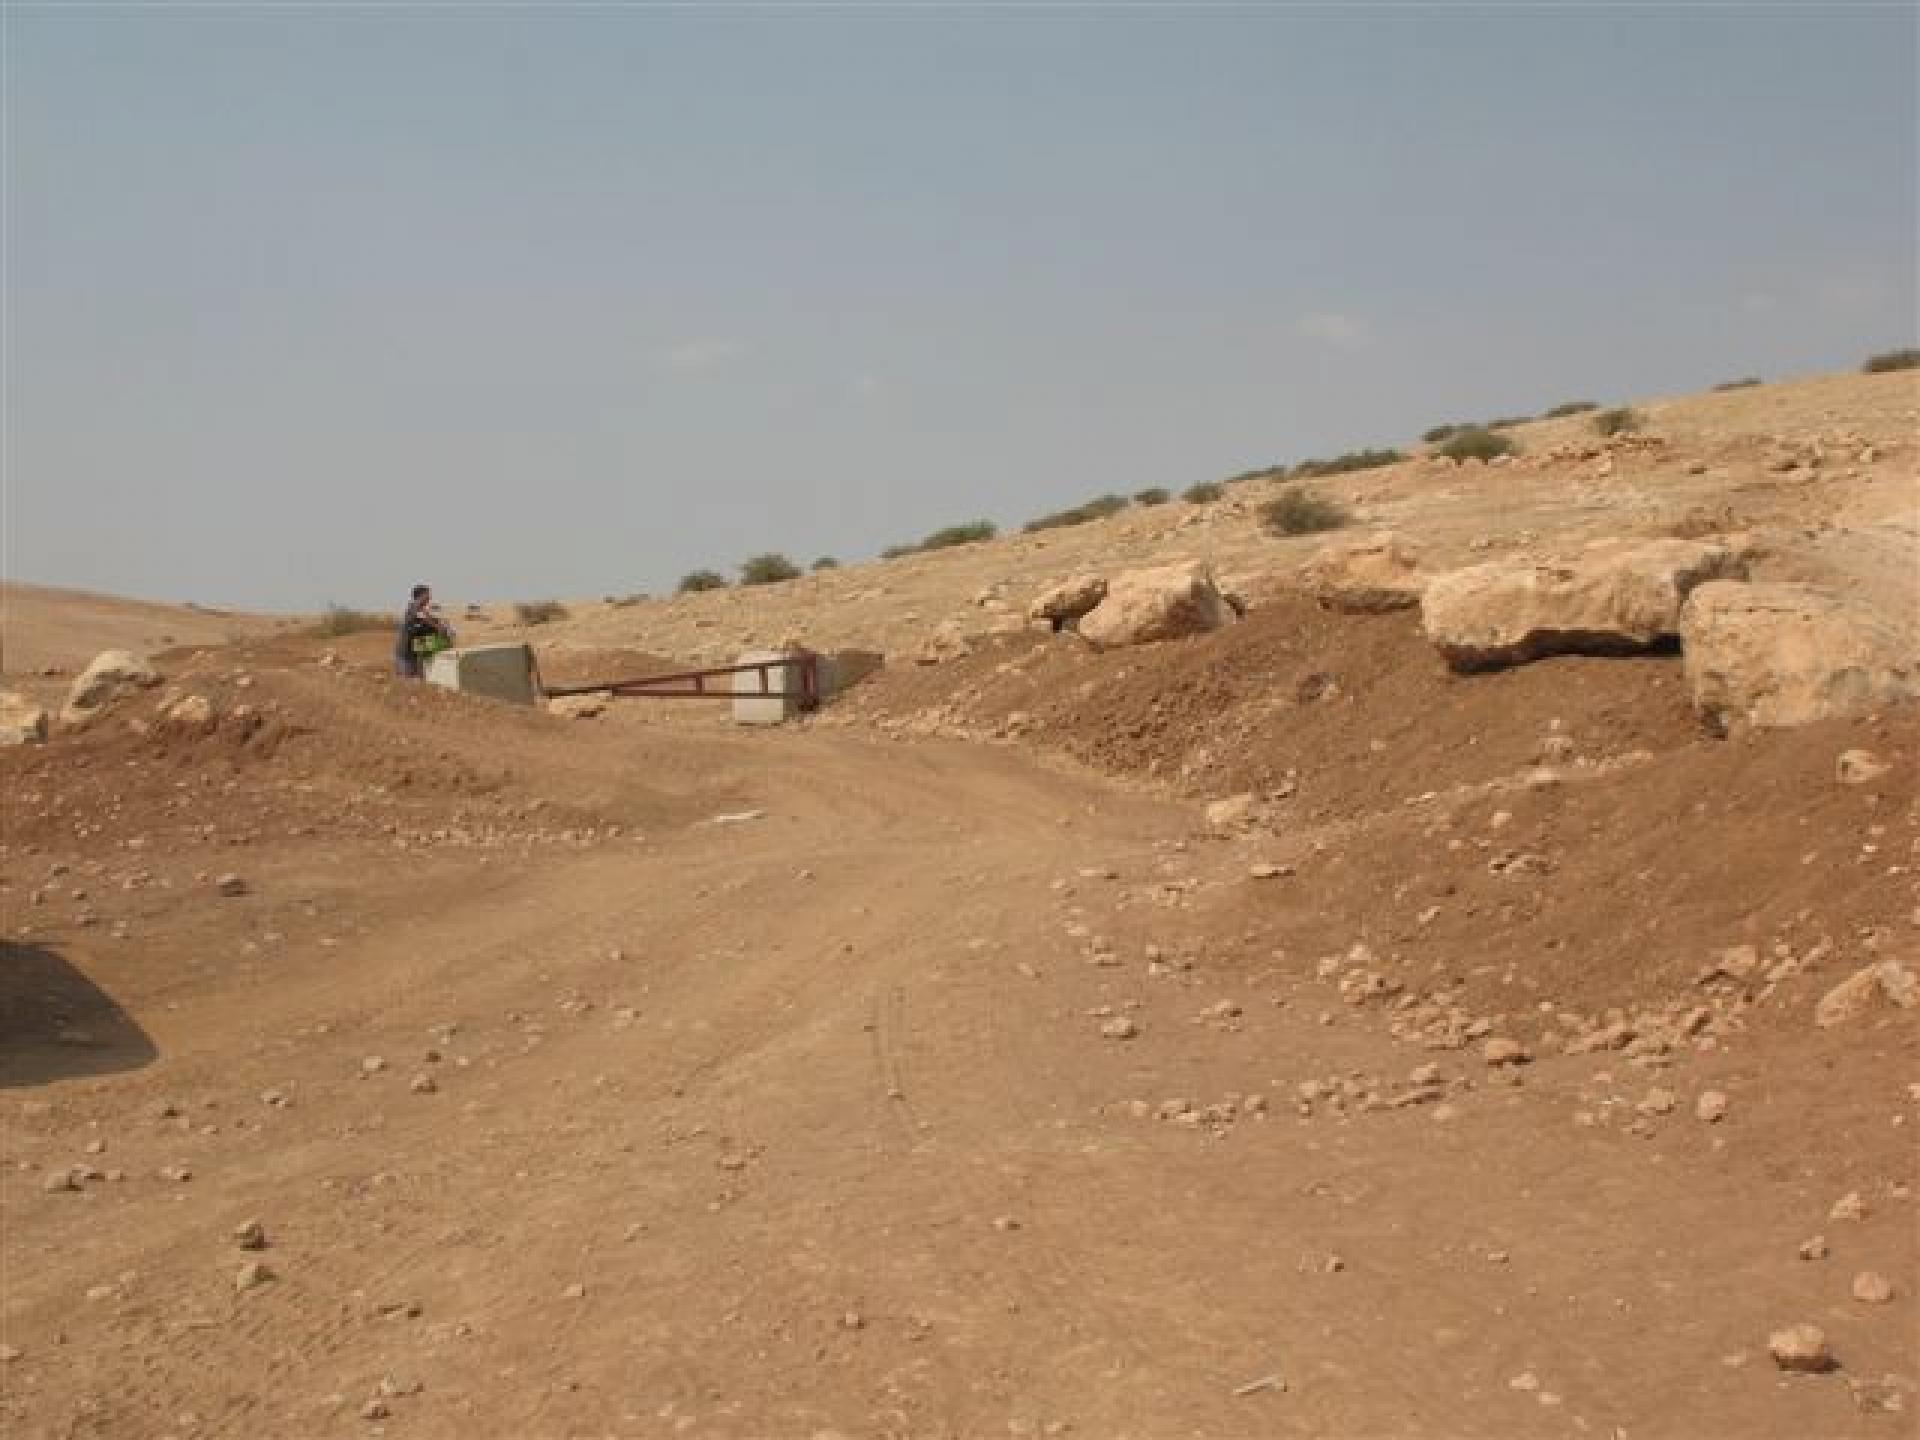 Gochia gate, Jordan valley 06.09.11